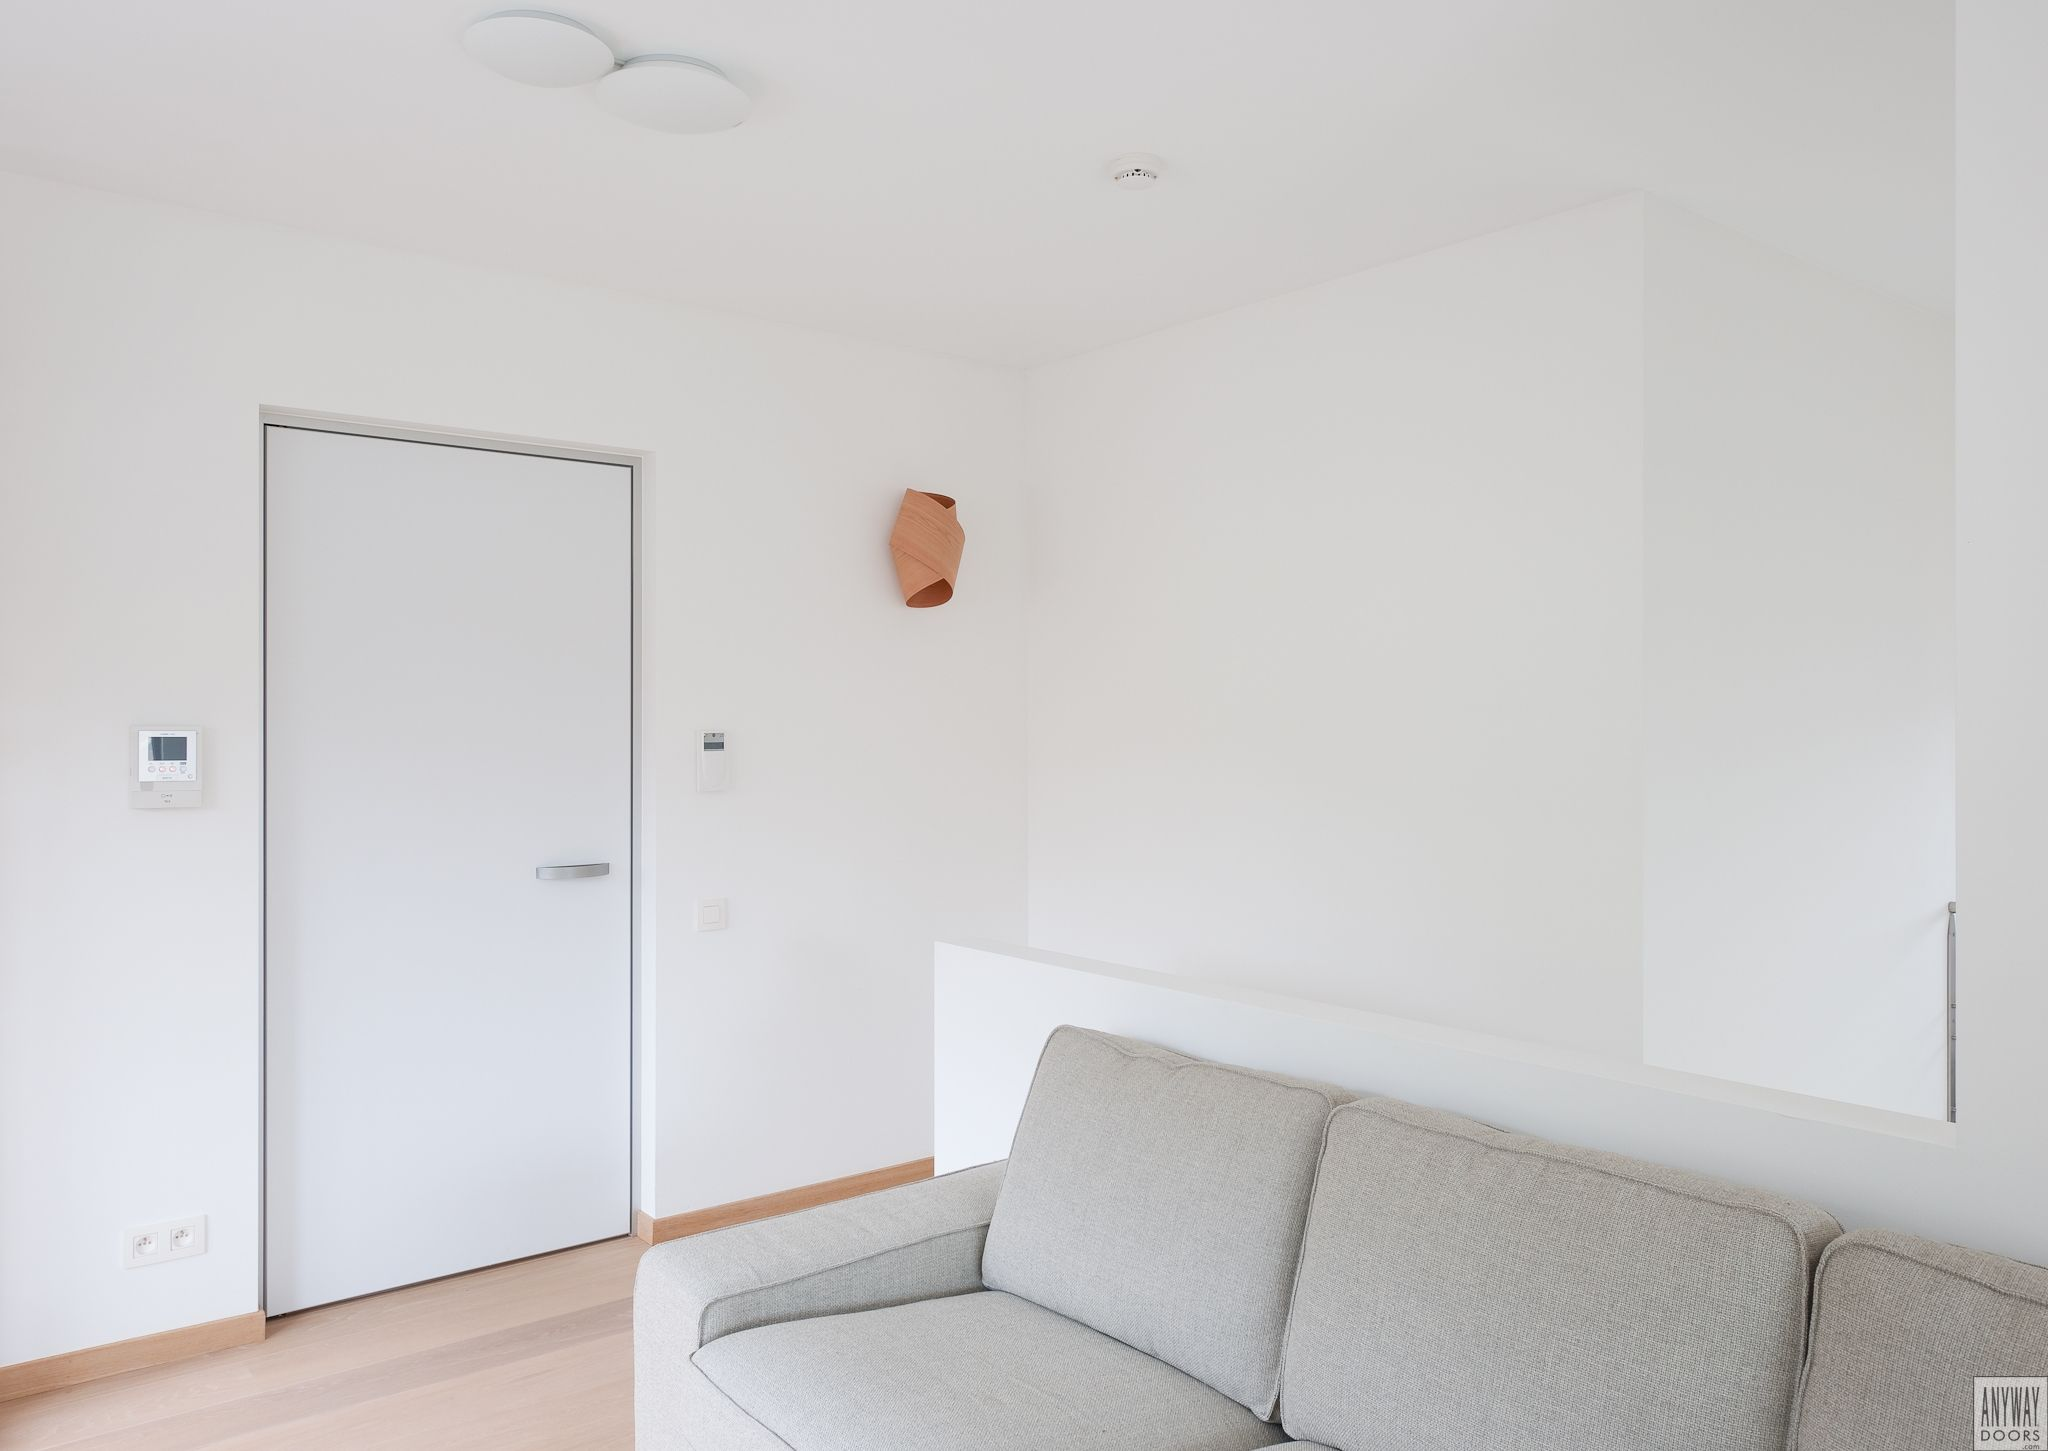 modern white interior door. Modern White Interior Door With A Minimalist Anodized Aluminium Frame T